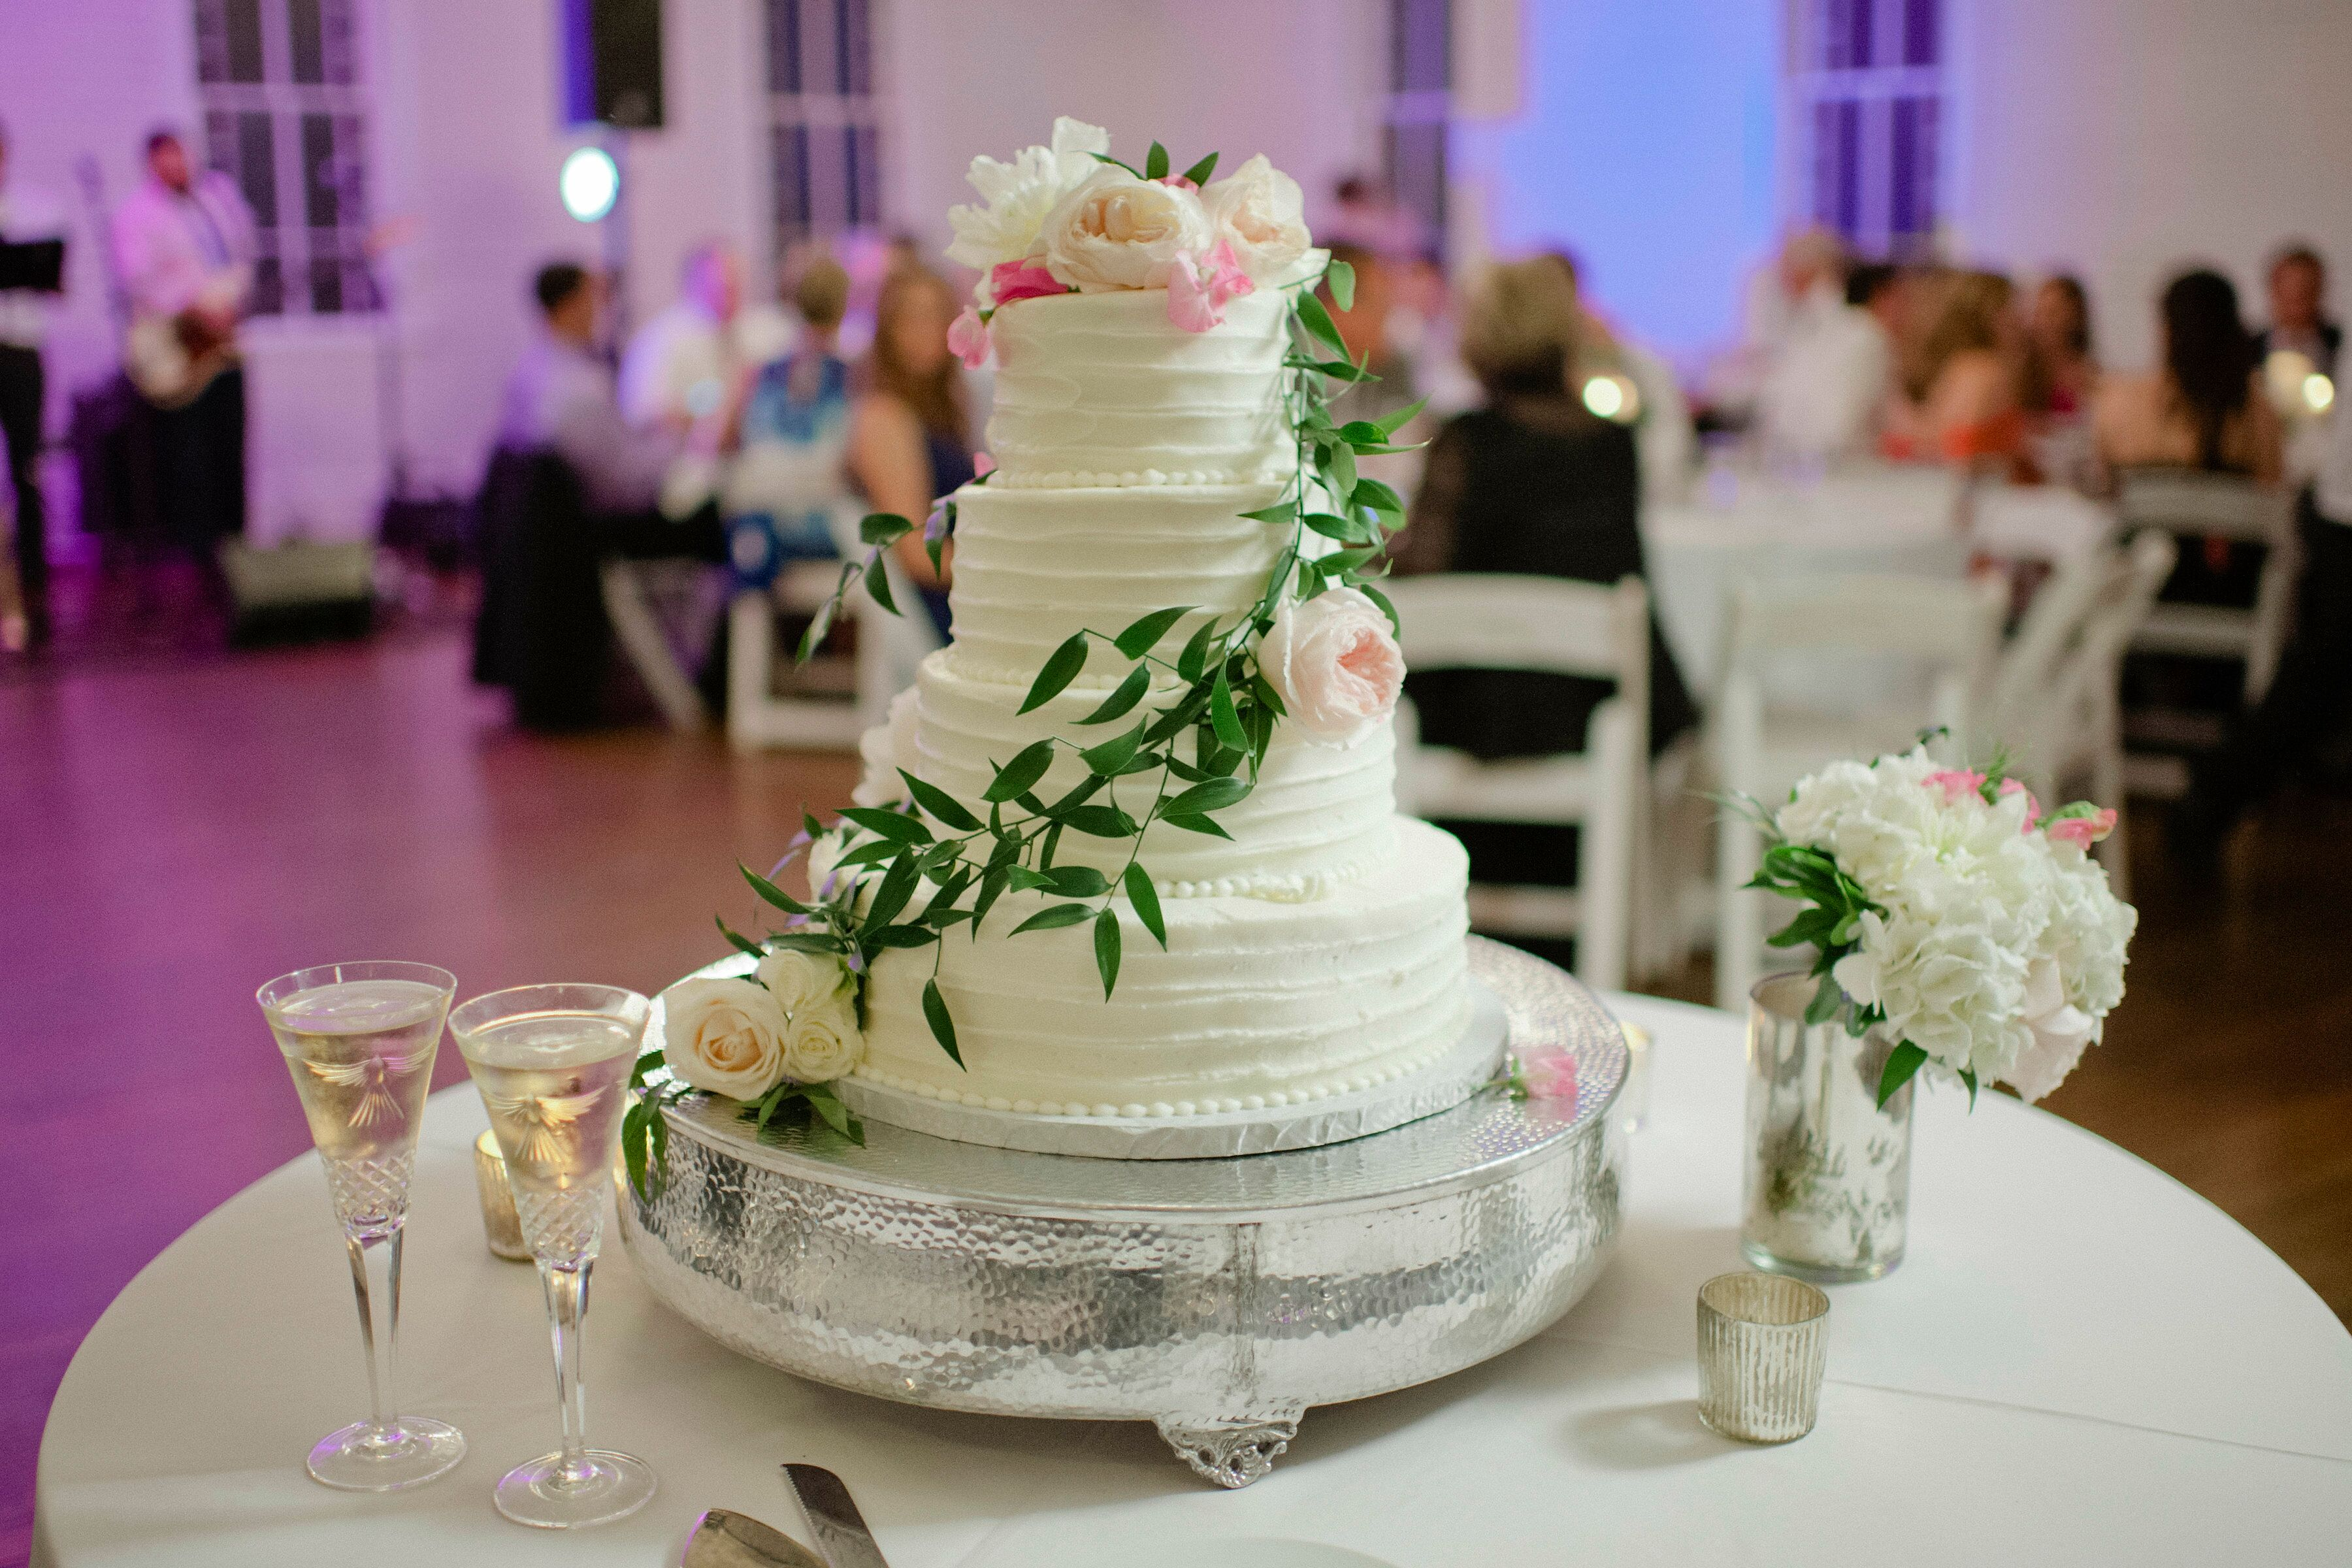 Wedding Cakes - Round Rock, TX